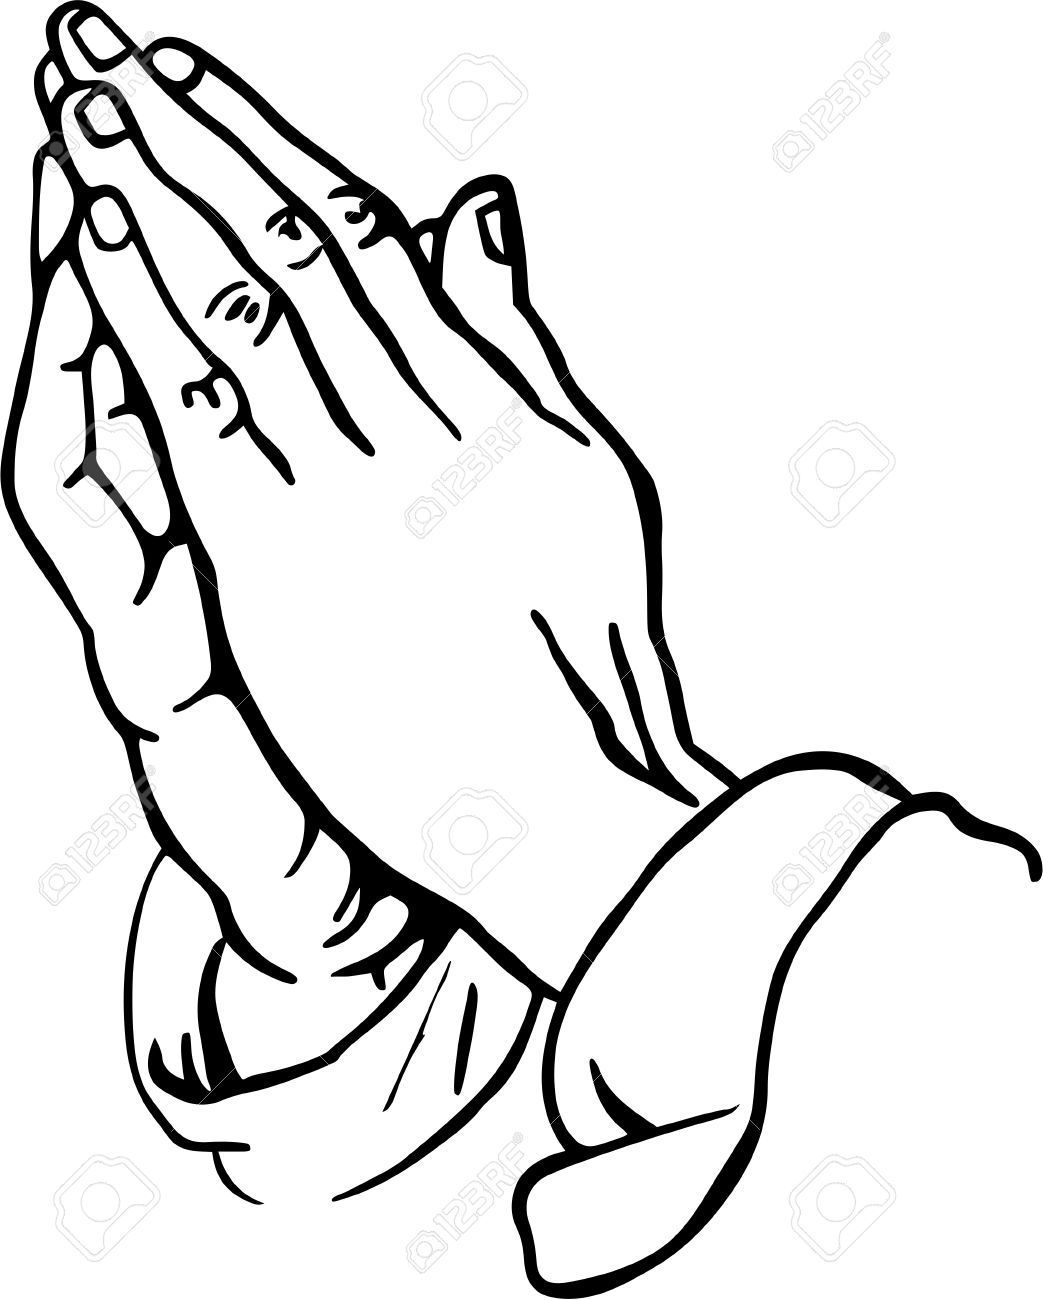 Praying Hands Clipart Stock Photo.